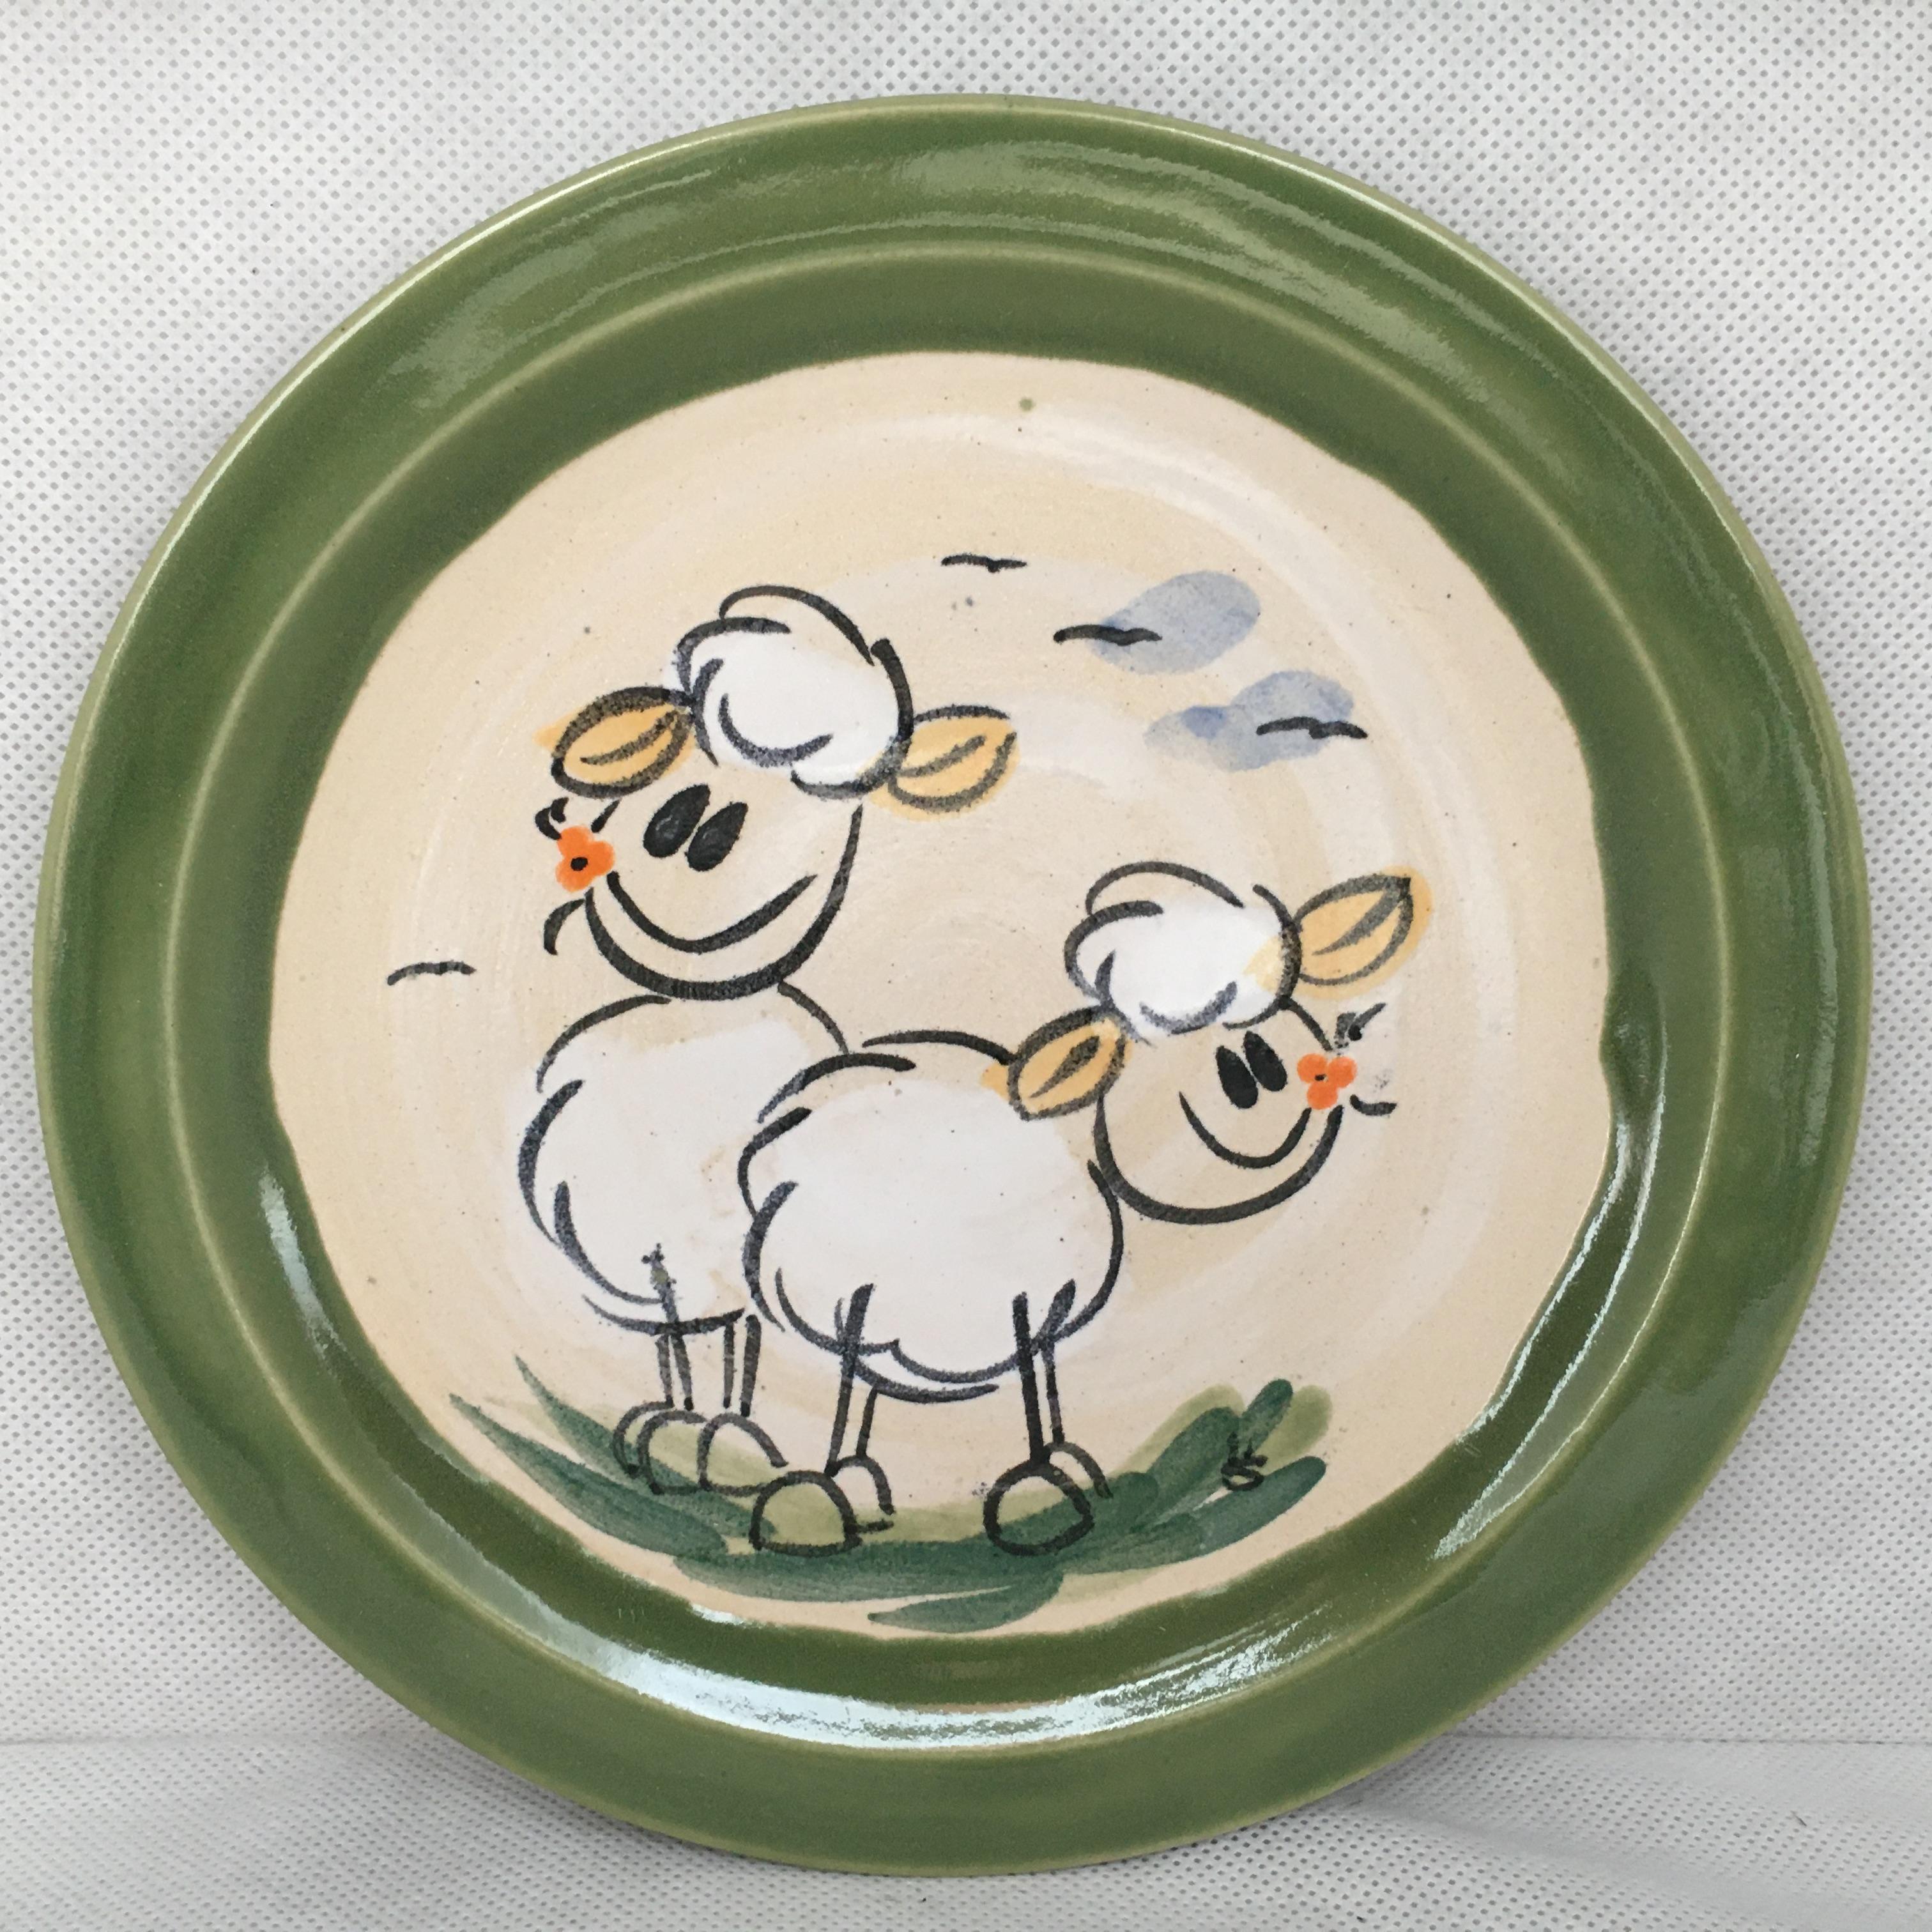 Teller Schaf